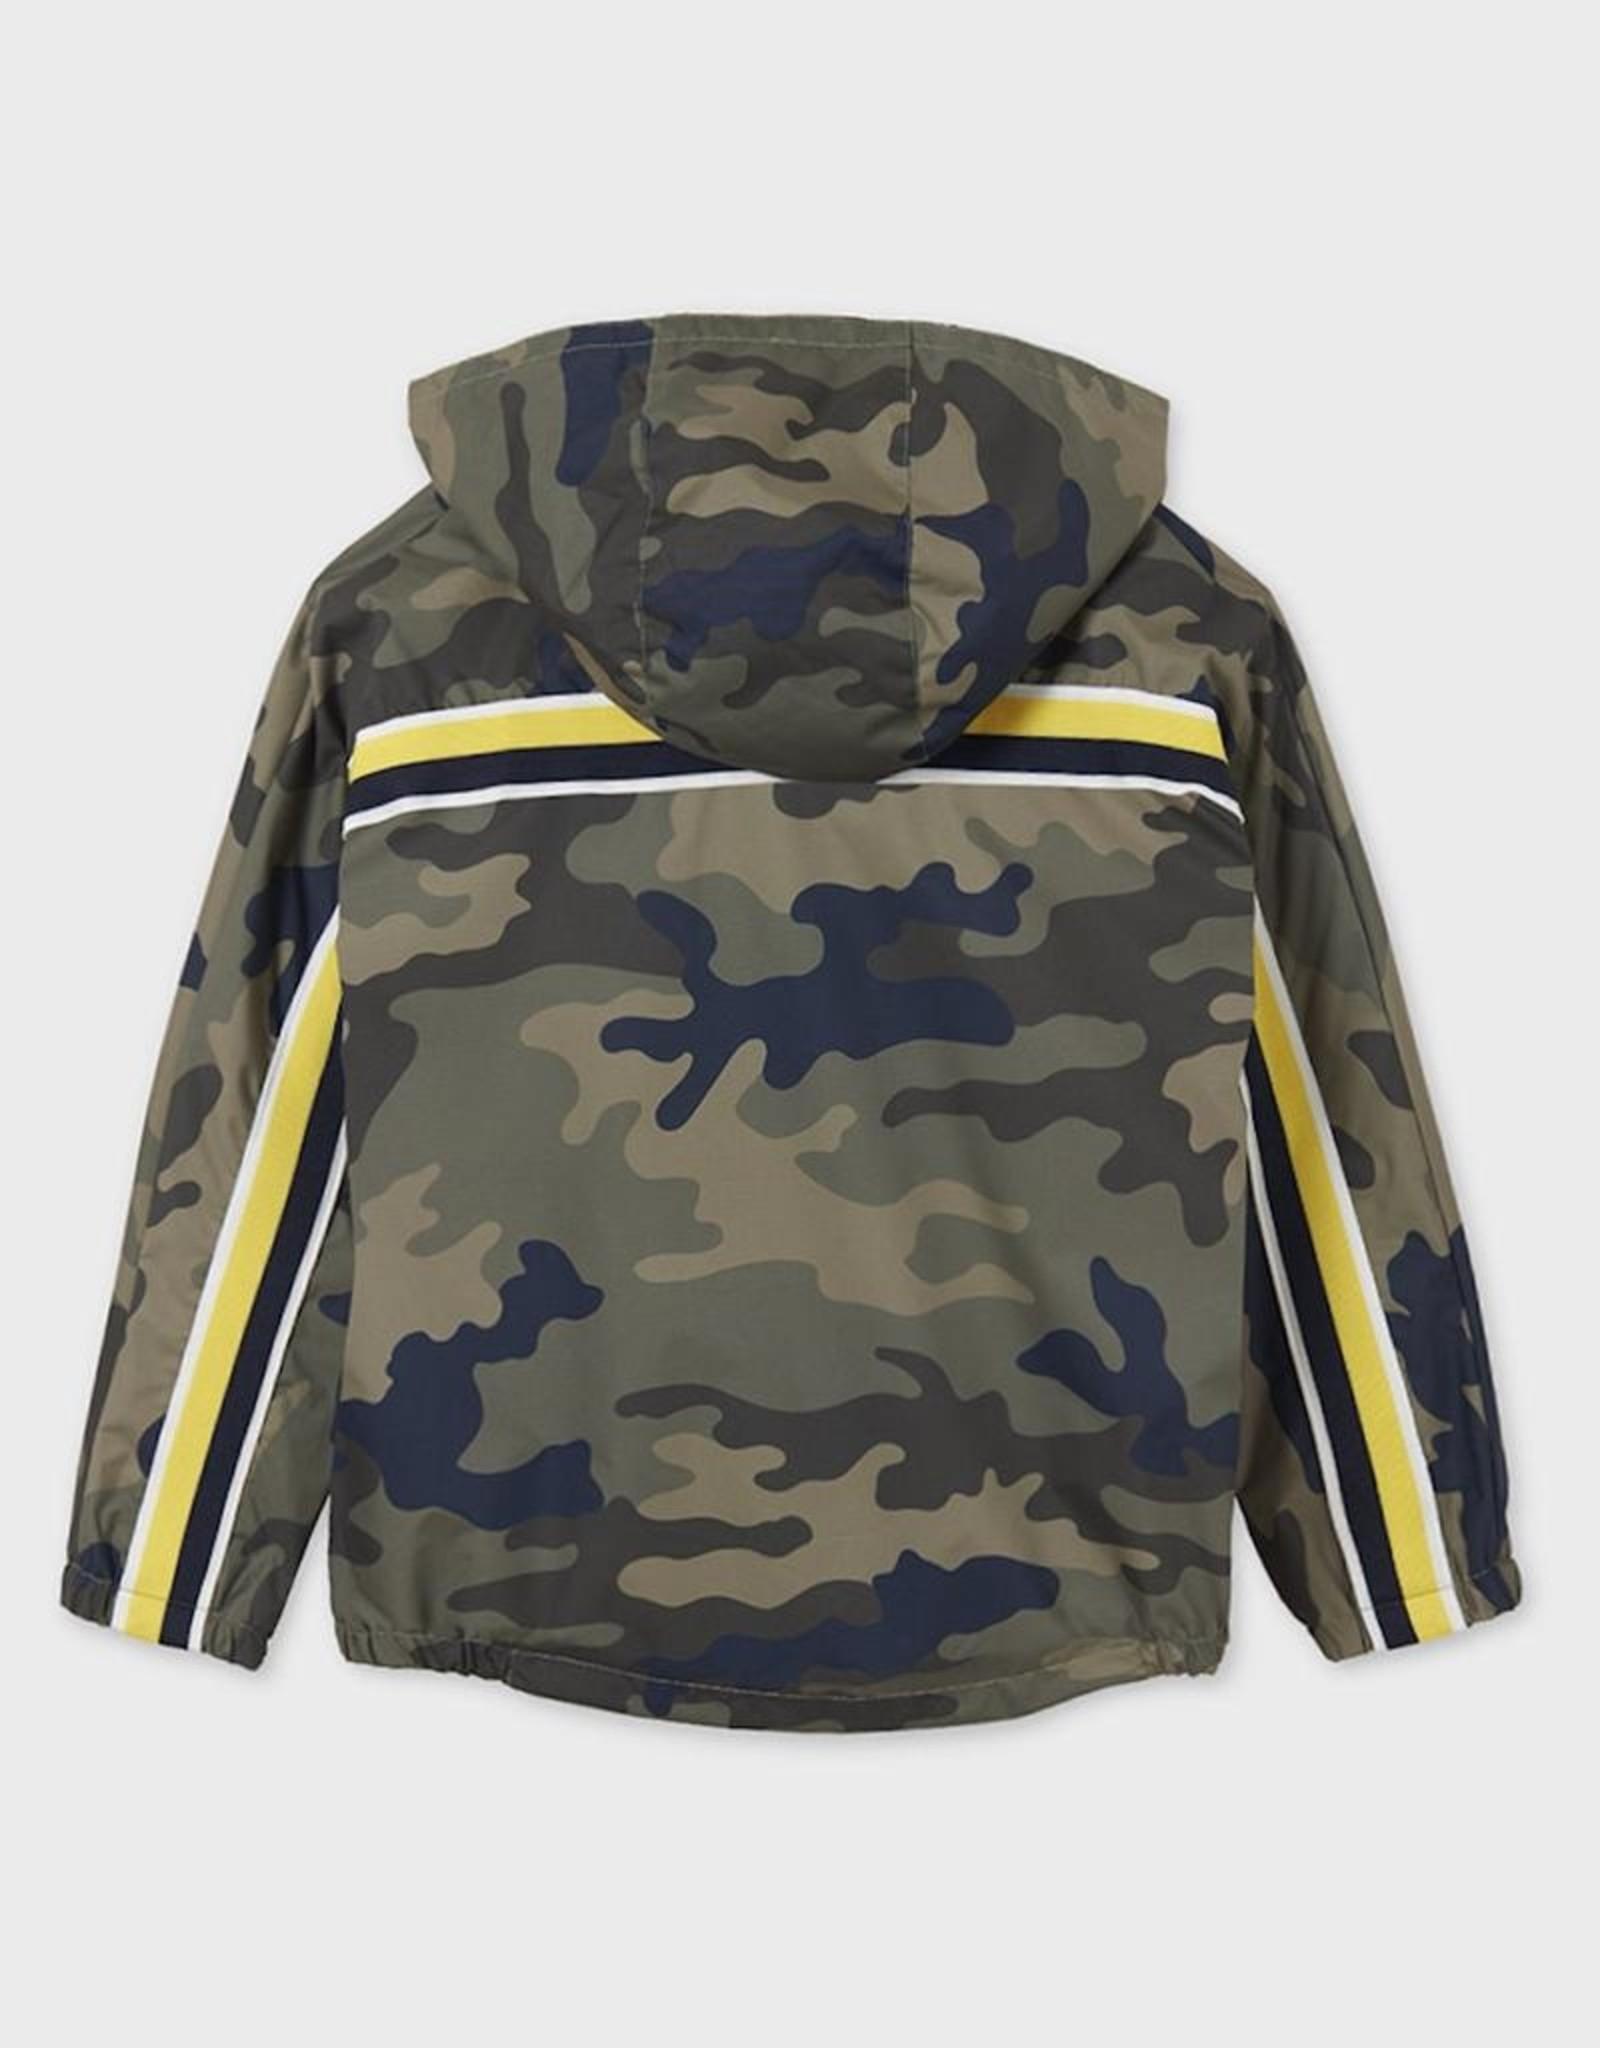 Mayoral Camo Printed Windbreaker Jacket